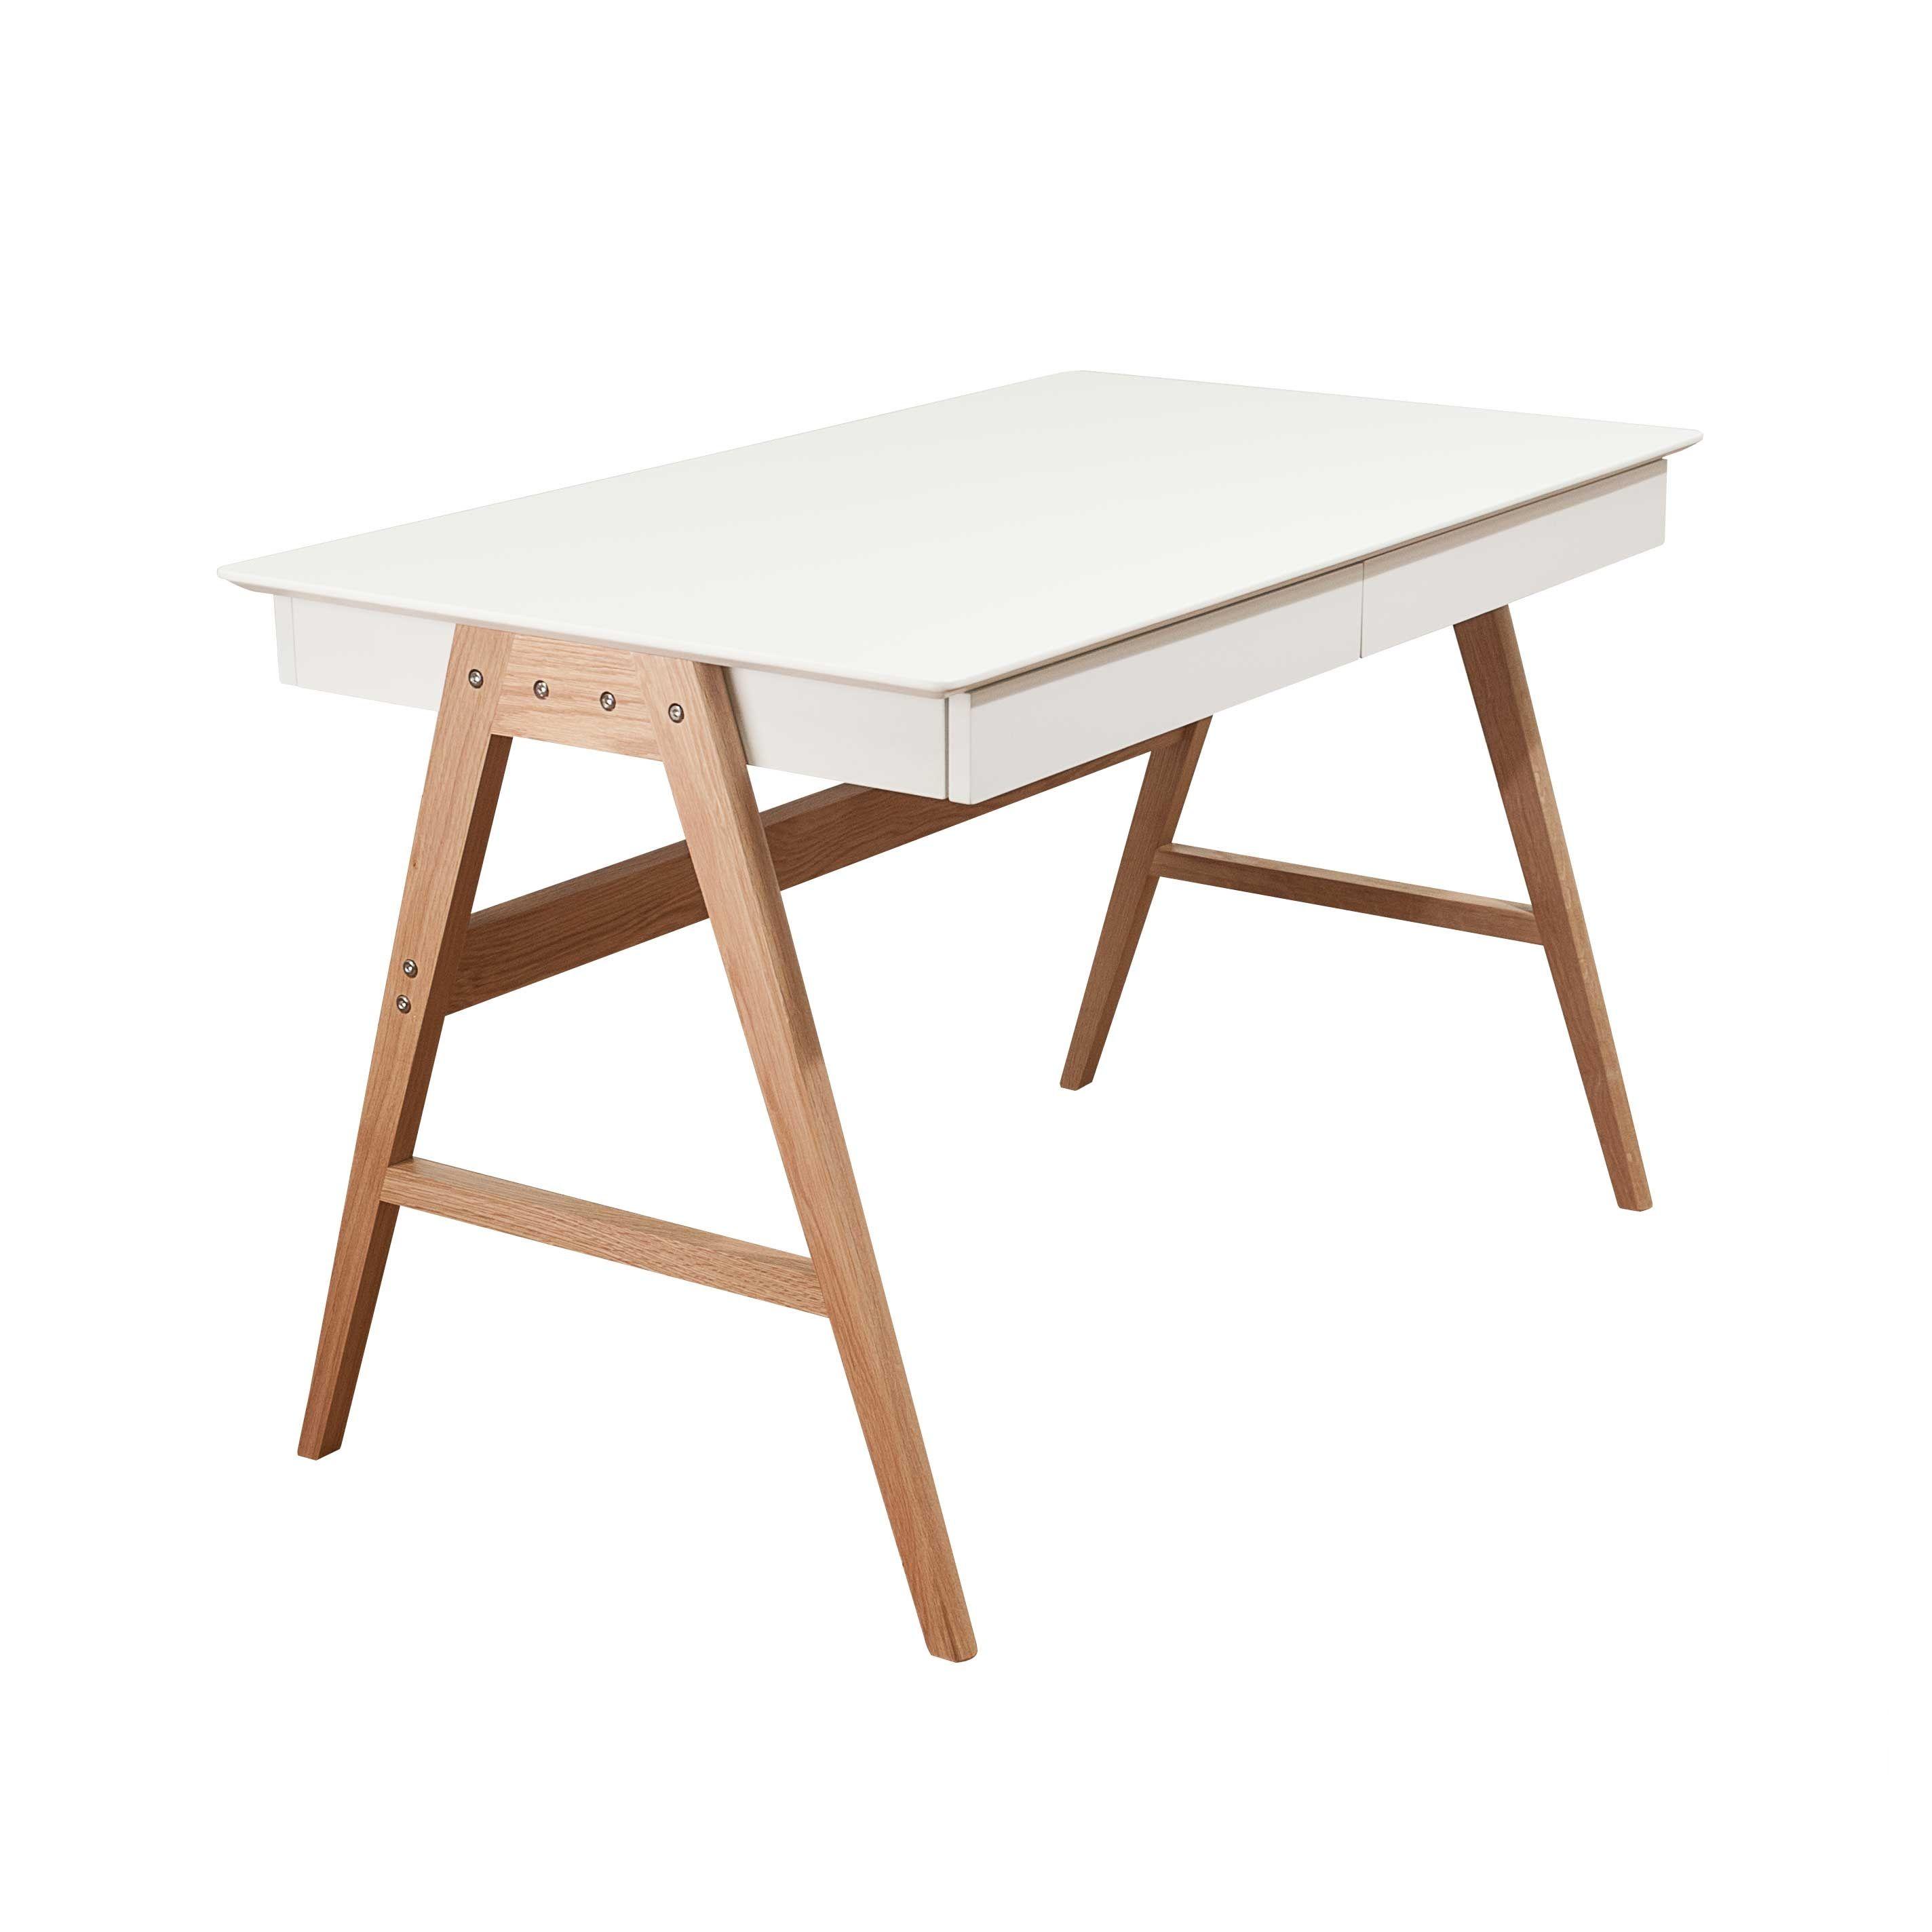 Vigo skrivebord (eik hvit) Dorothea.no | Møbler